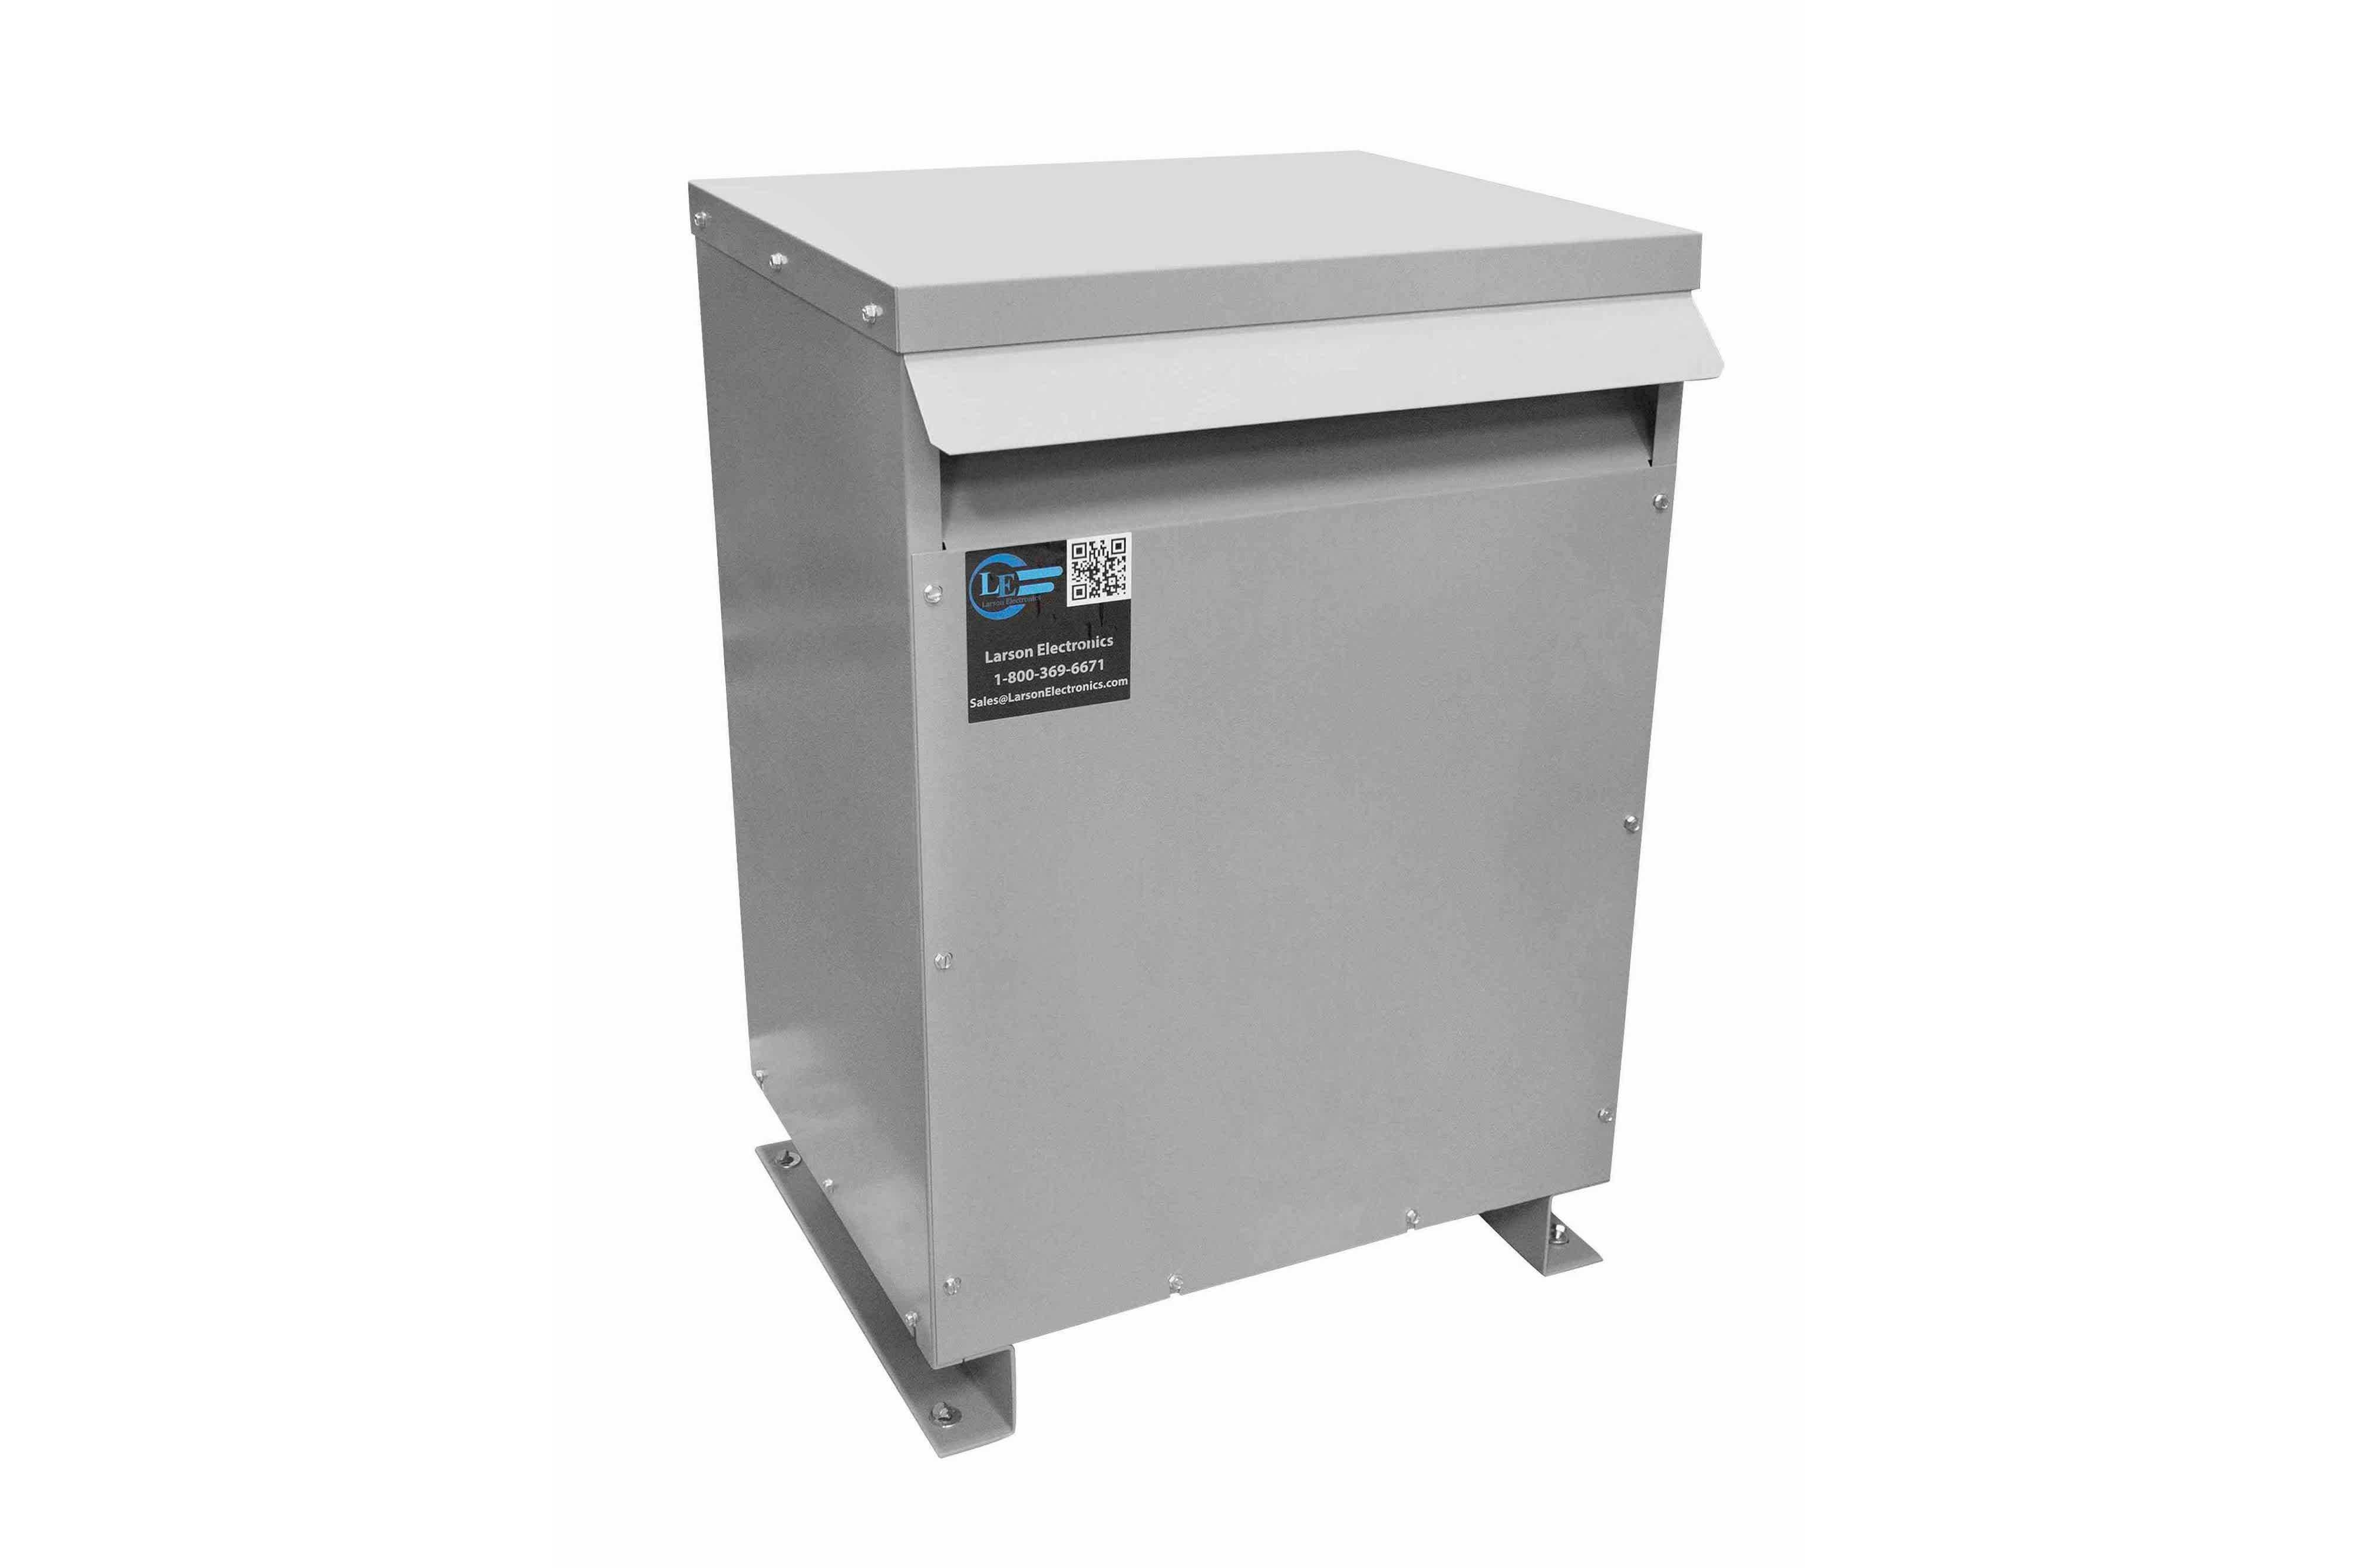 20 kVA 3PH Isolation Transformer, 380V Wye Primary, 480V Delta Secondary, N3R, Ventilated, 60 Hz